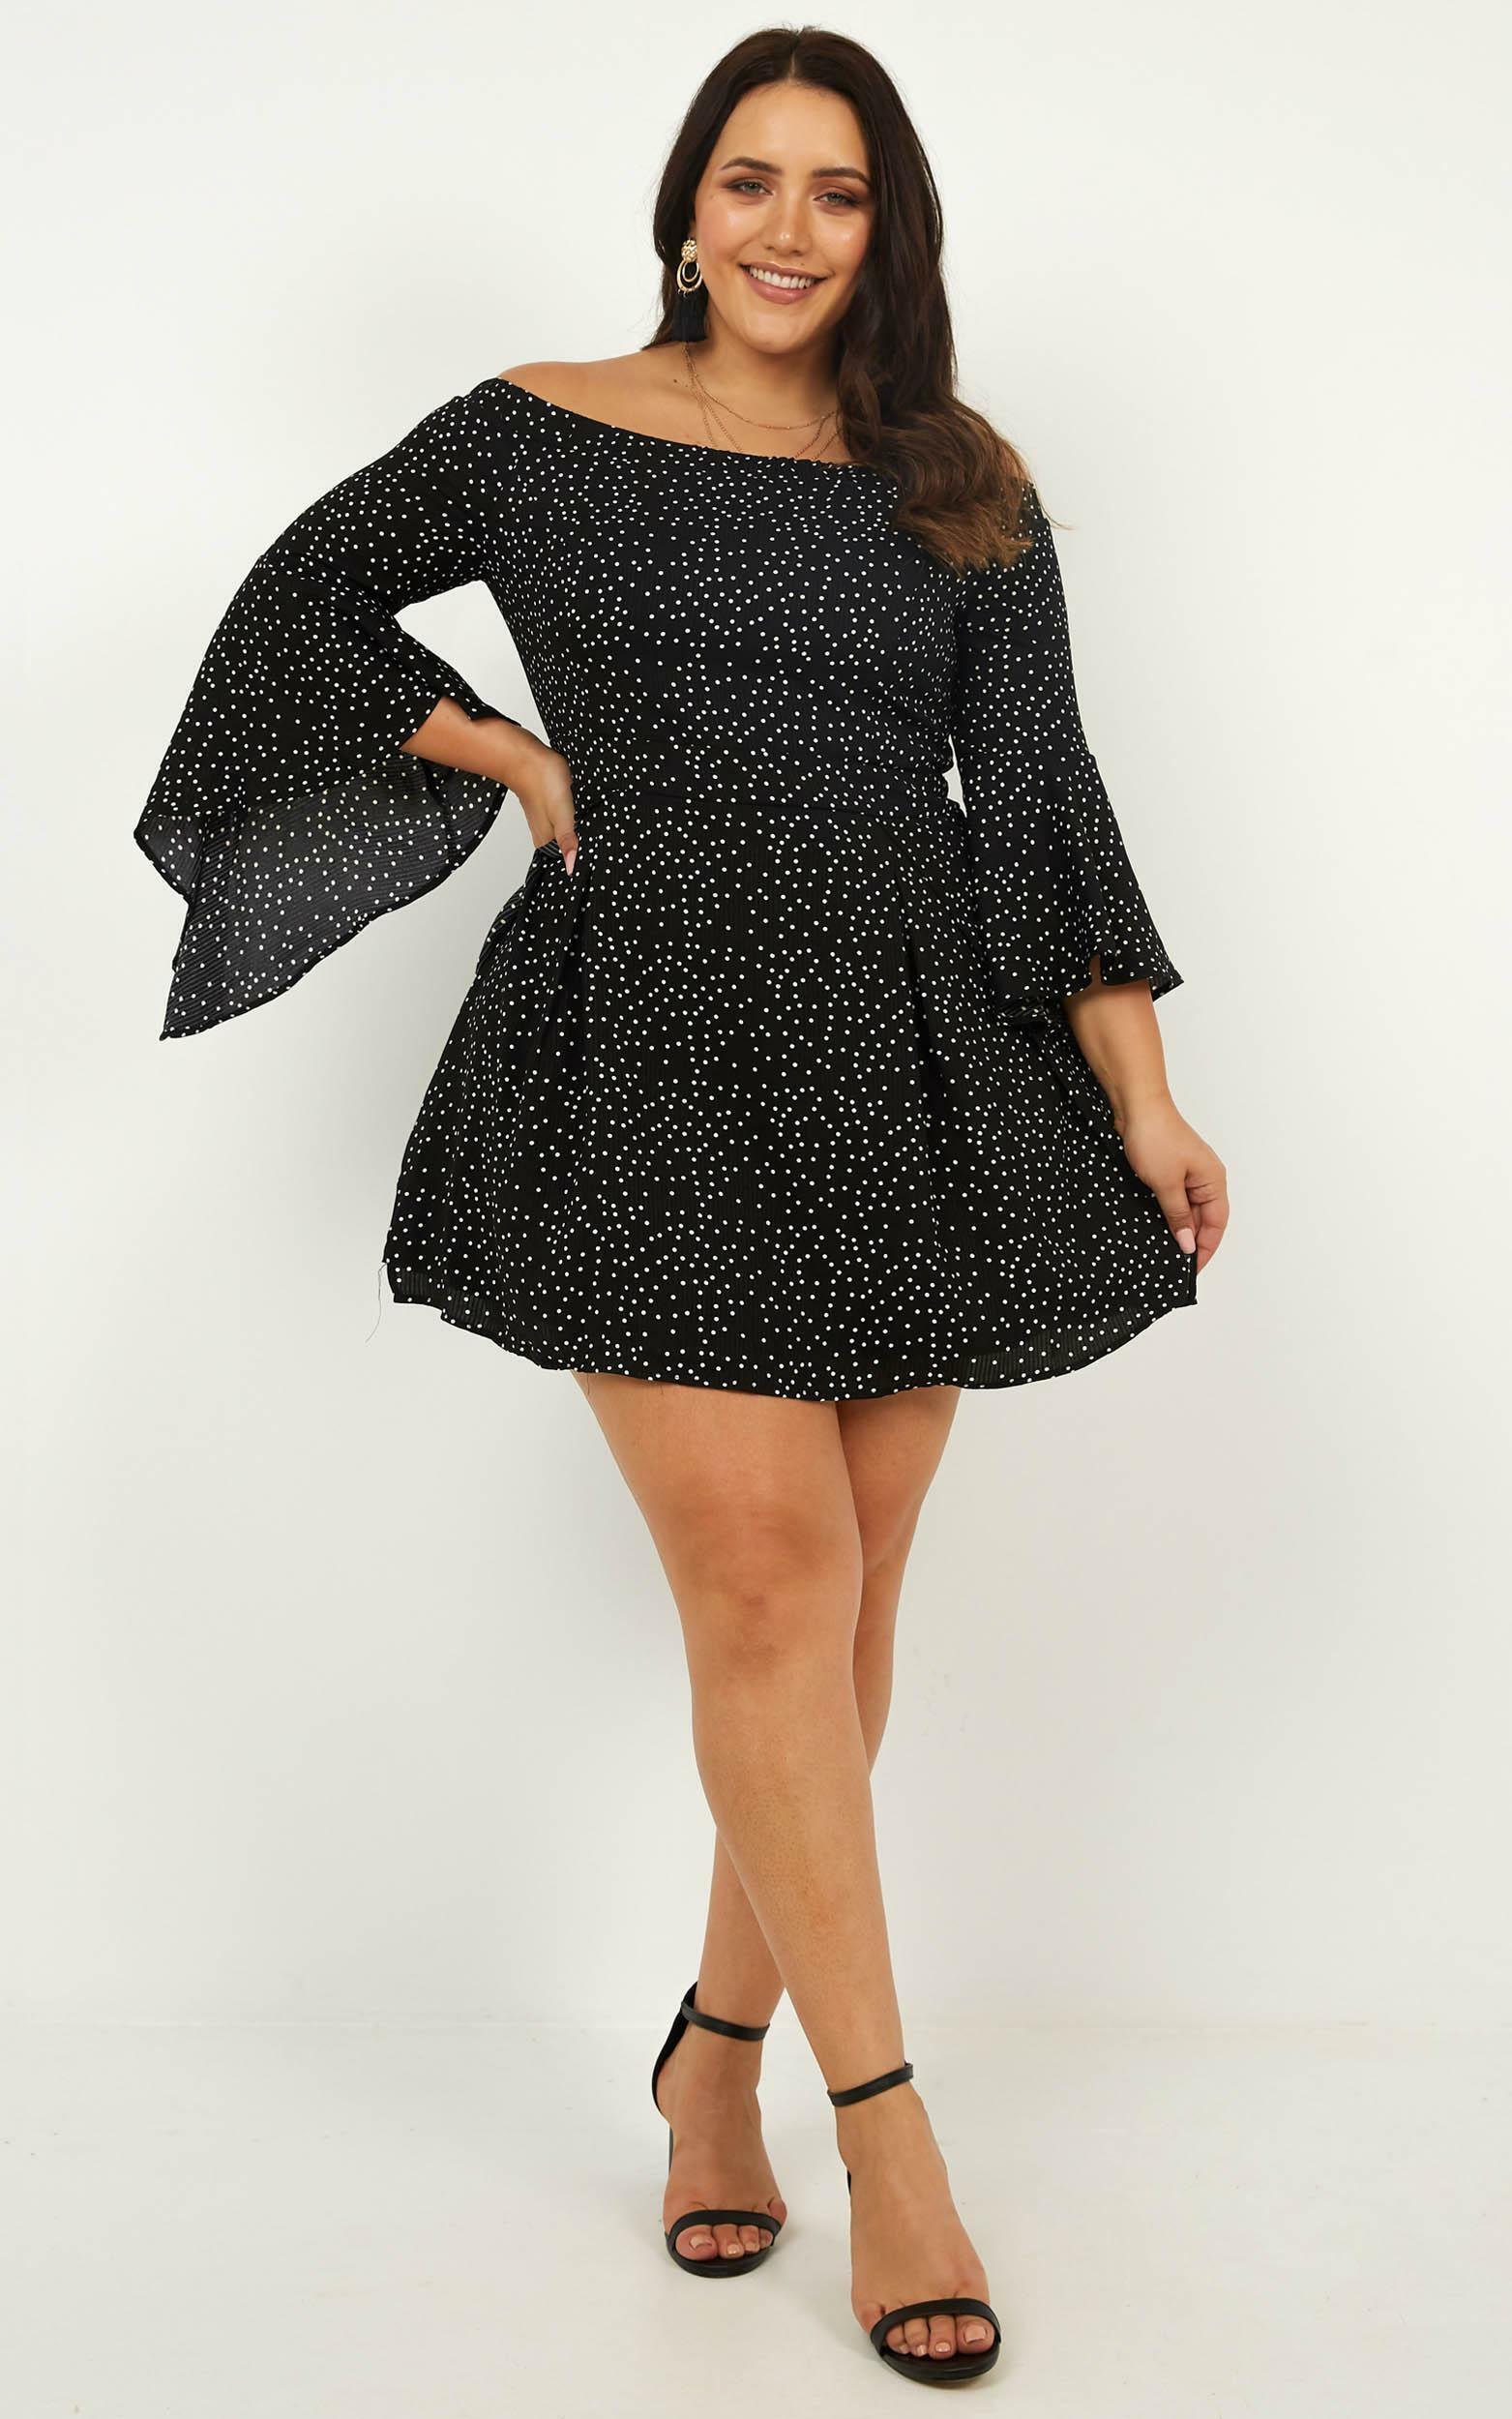 Break My Heart Dress In black spot - 20 (XXXXL), Black, hi-res image number null